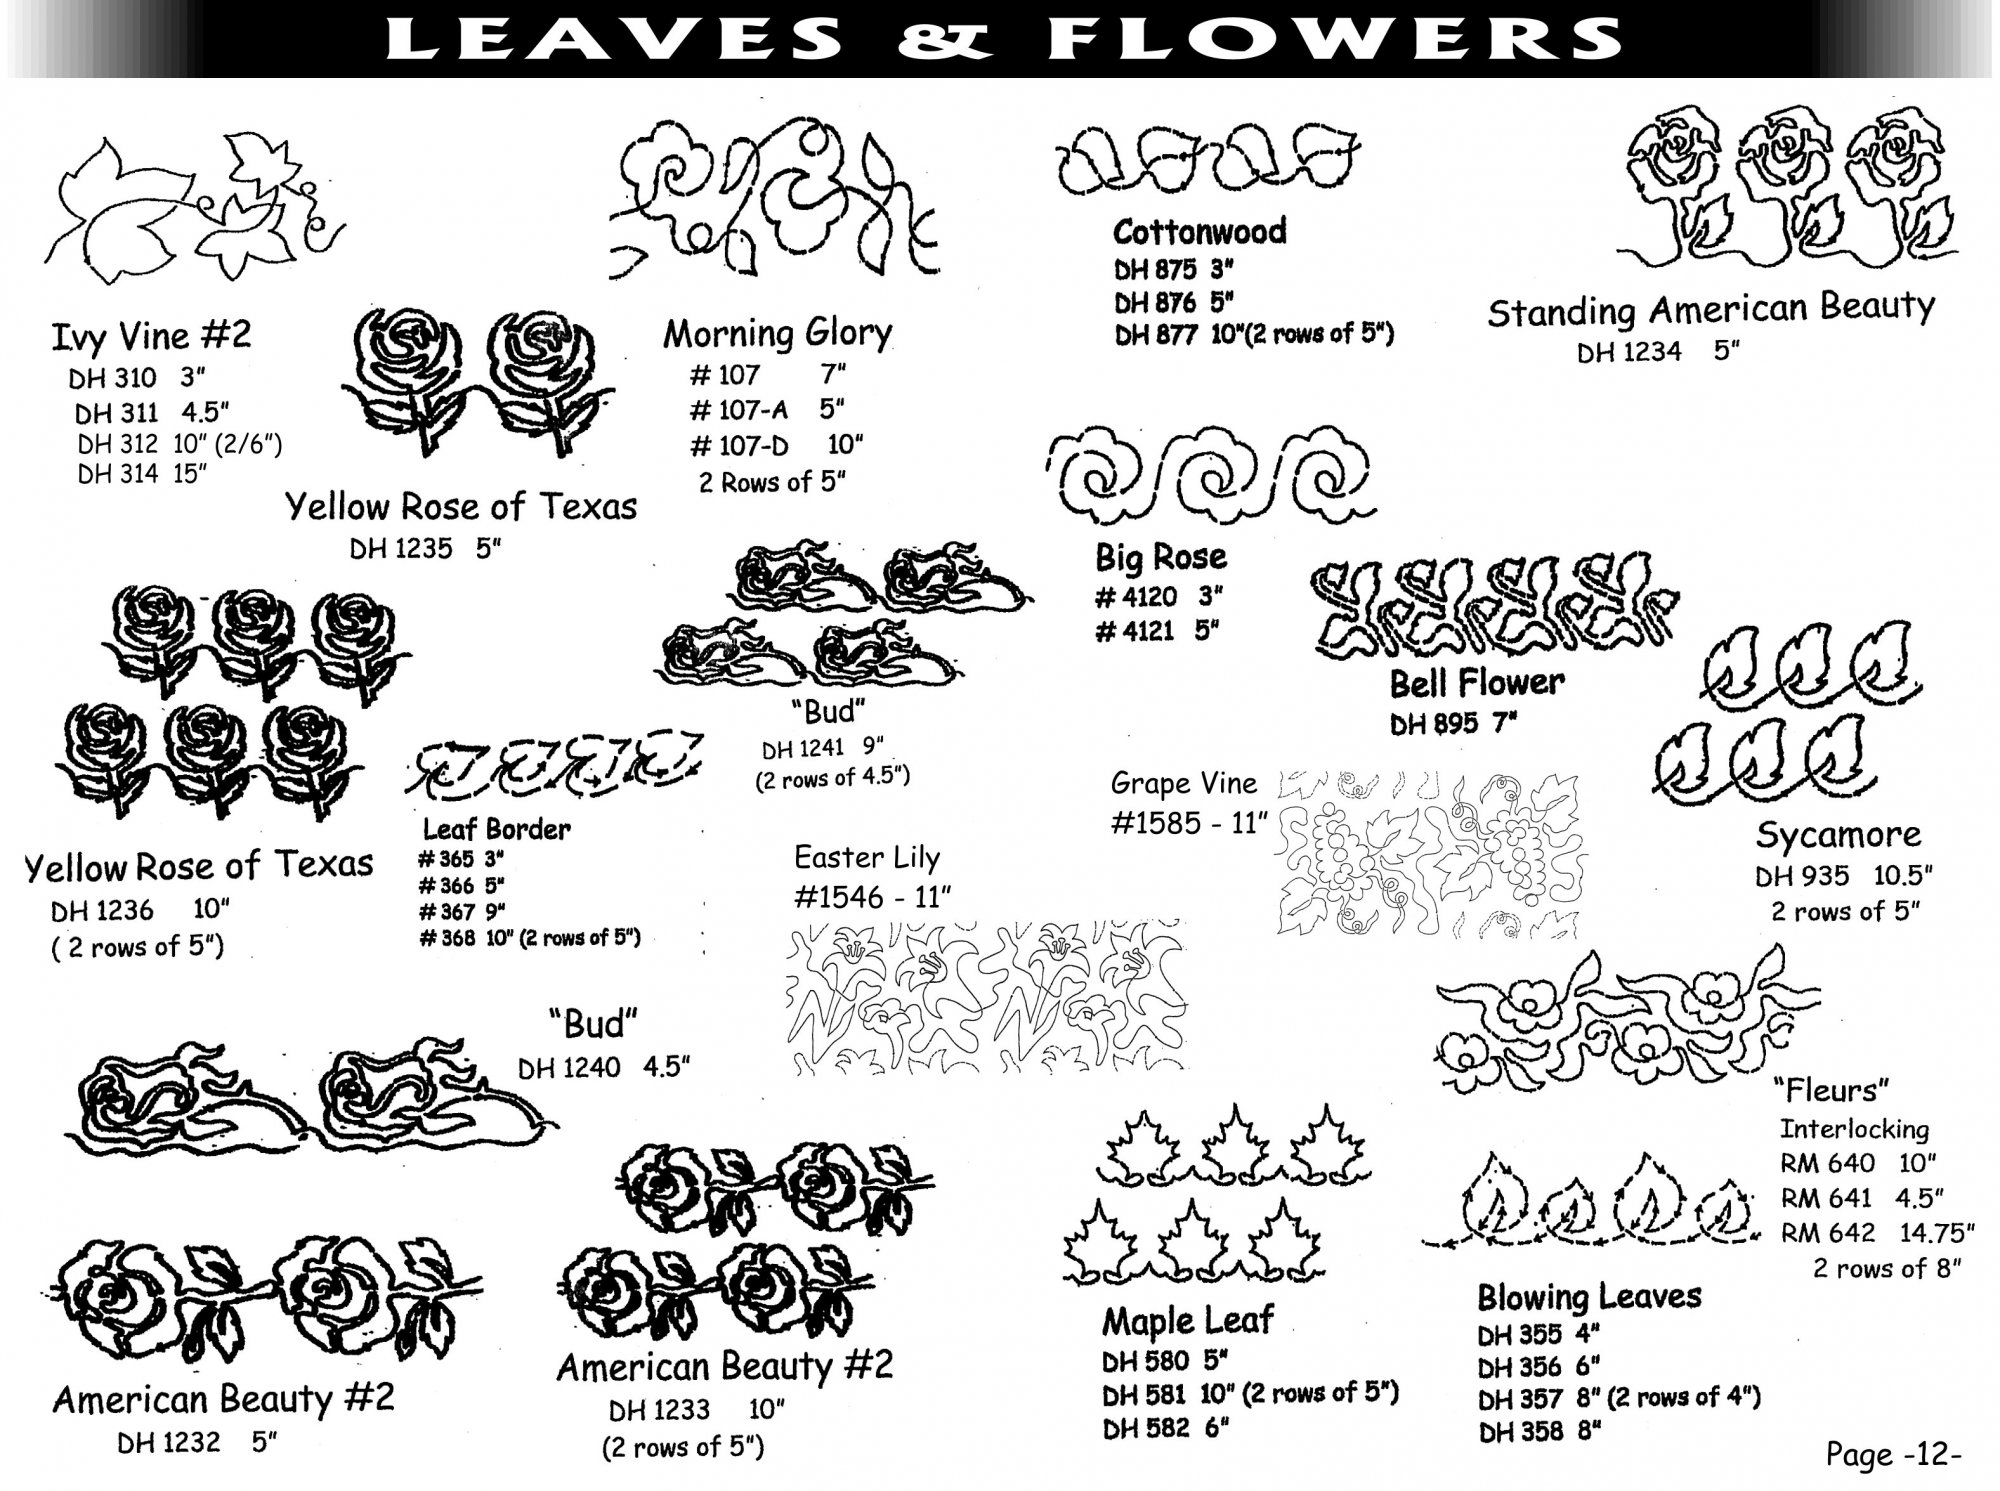 Pantographs-Leaves&Flowers-A- 6 1/2 -12